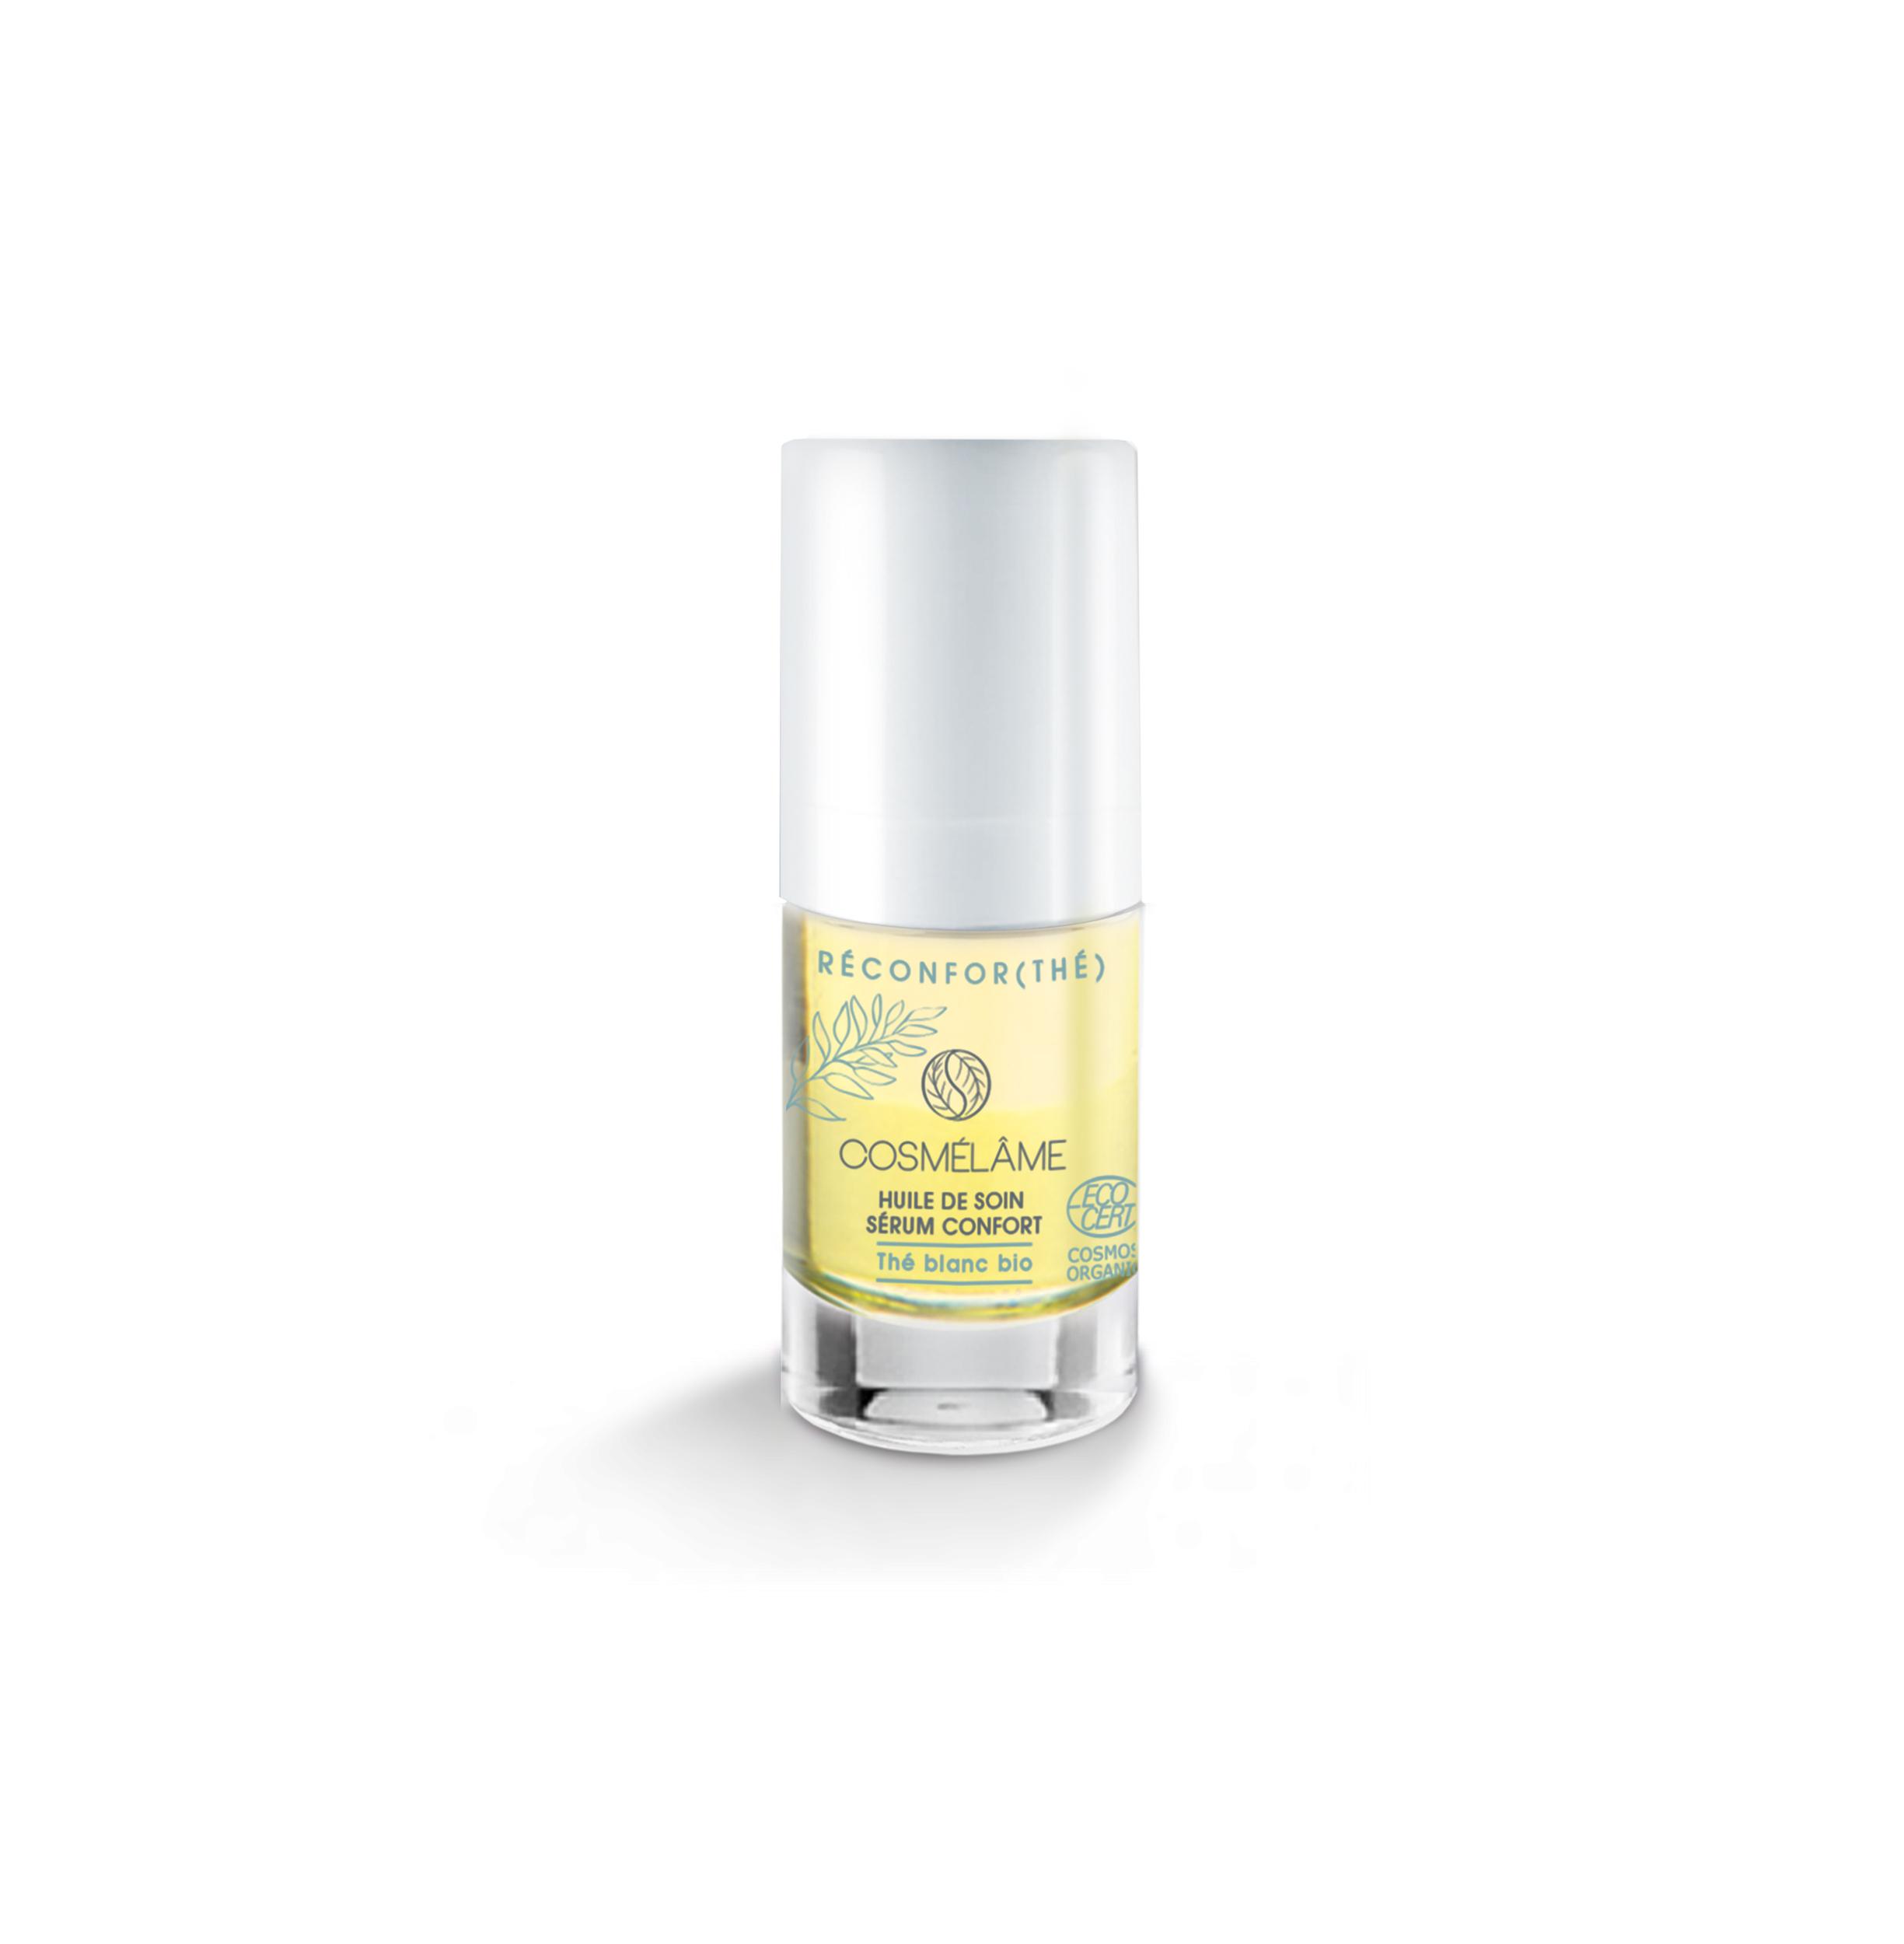 huile de soin sérum confort Cosmelame 20ml